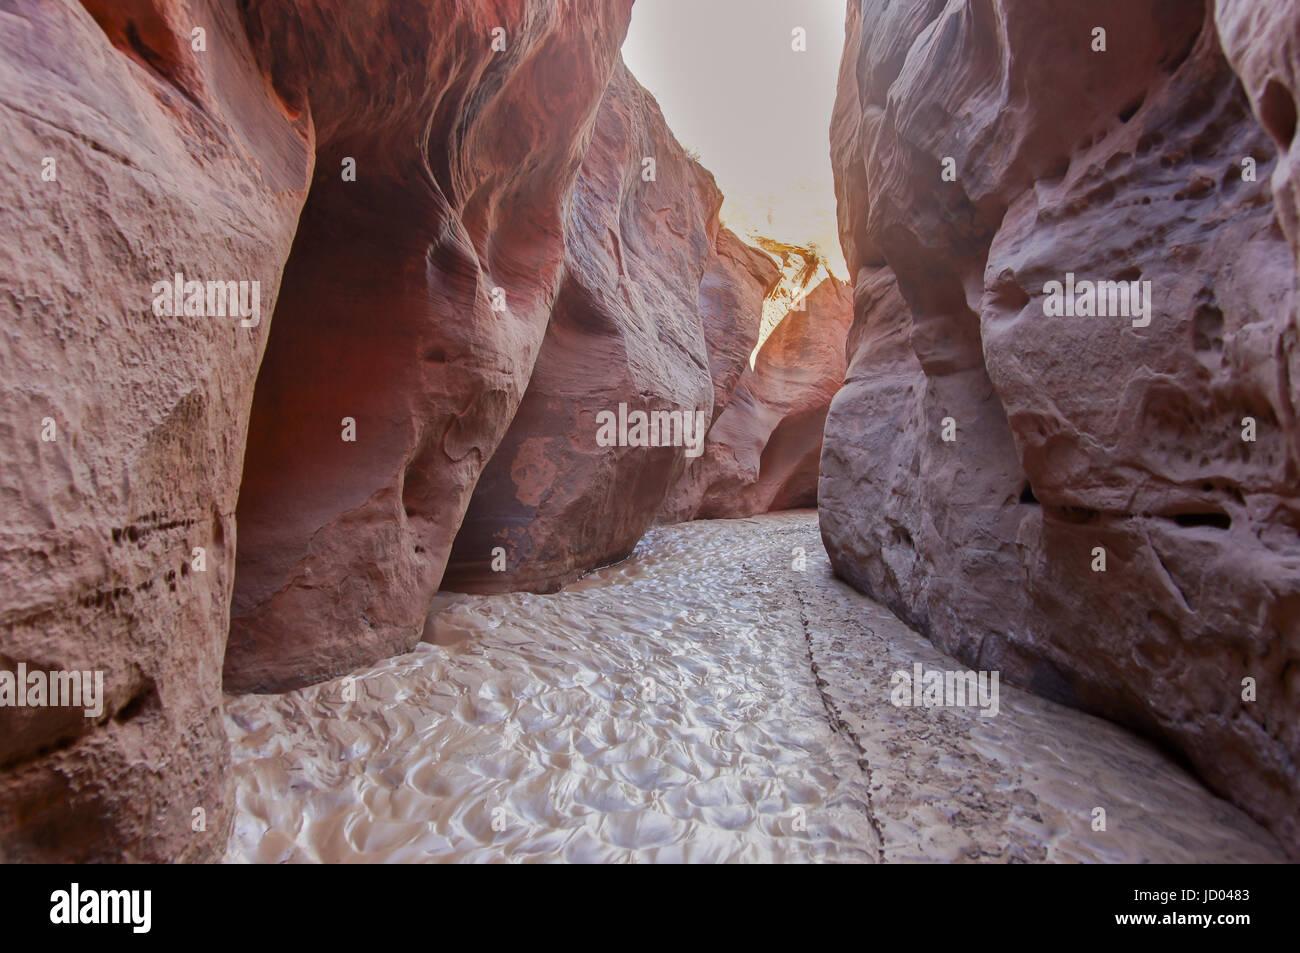 Inside of Buckskin Gulch Slot Canyon. Stock Photo